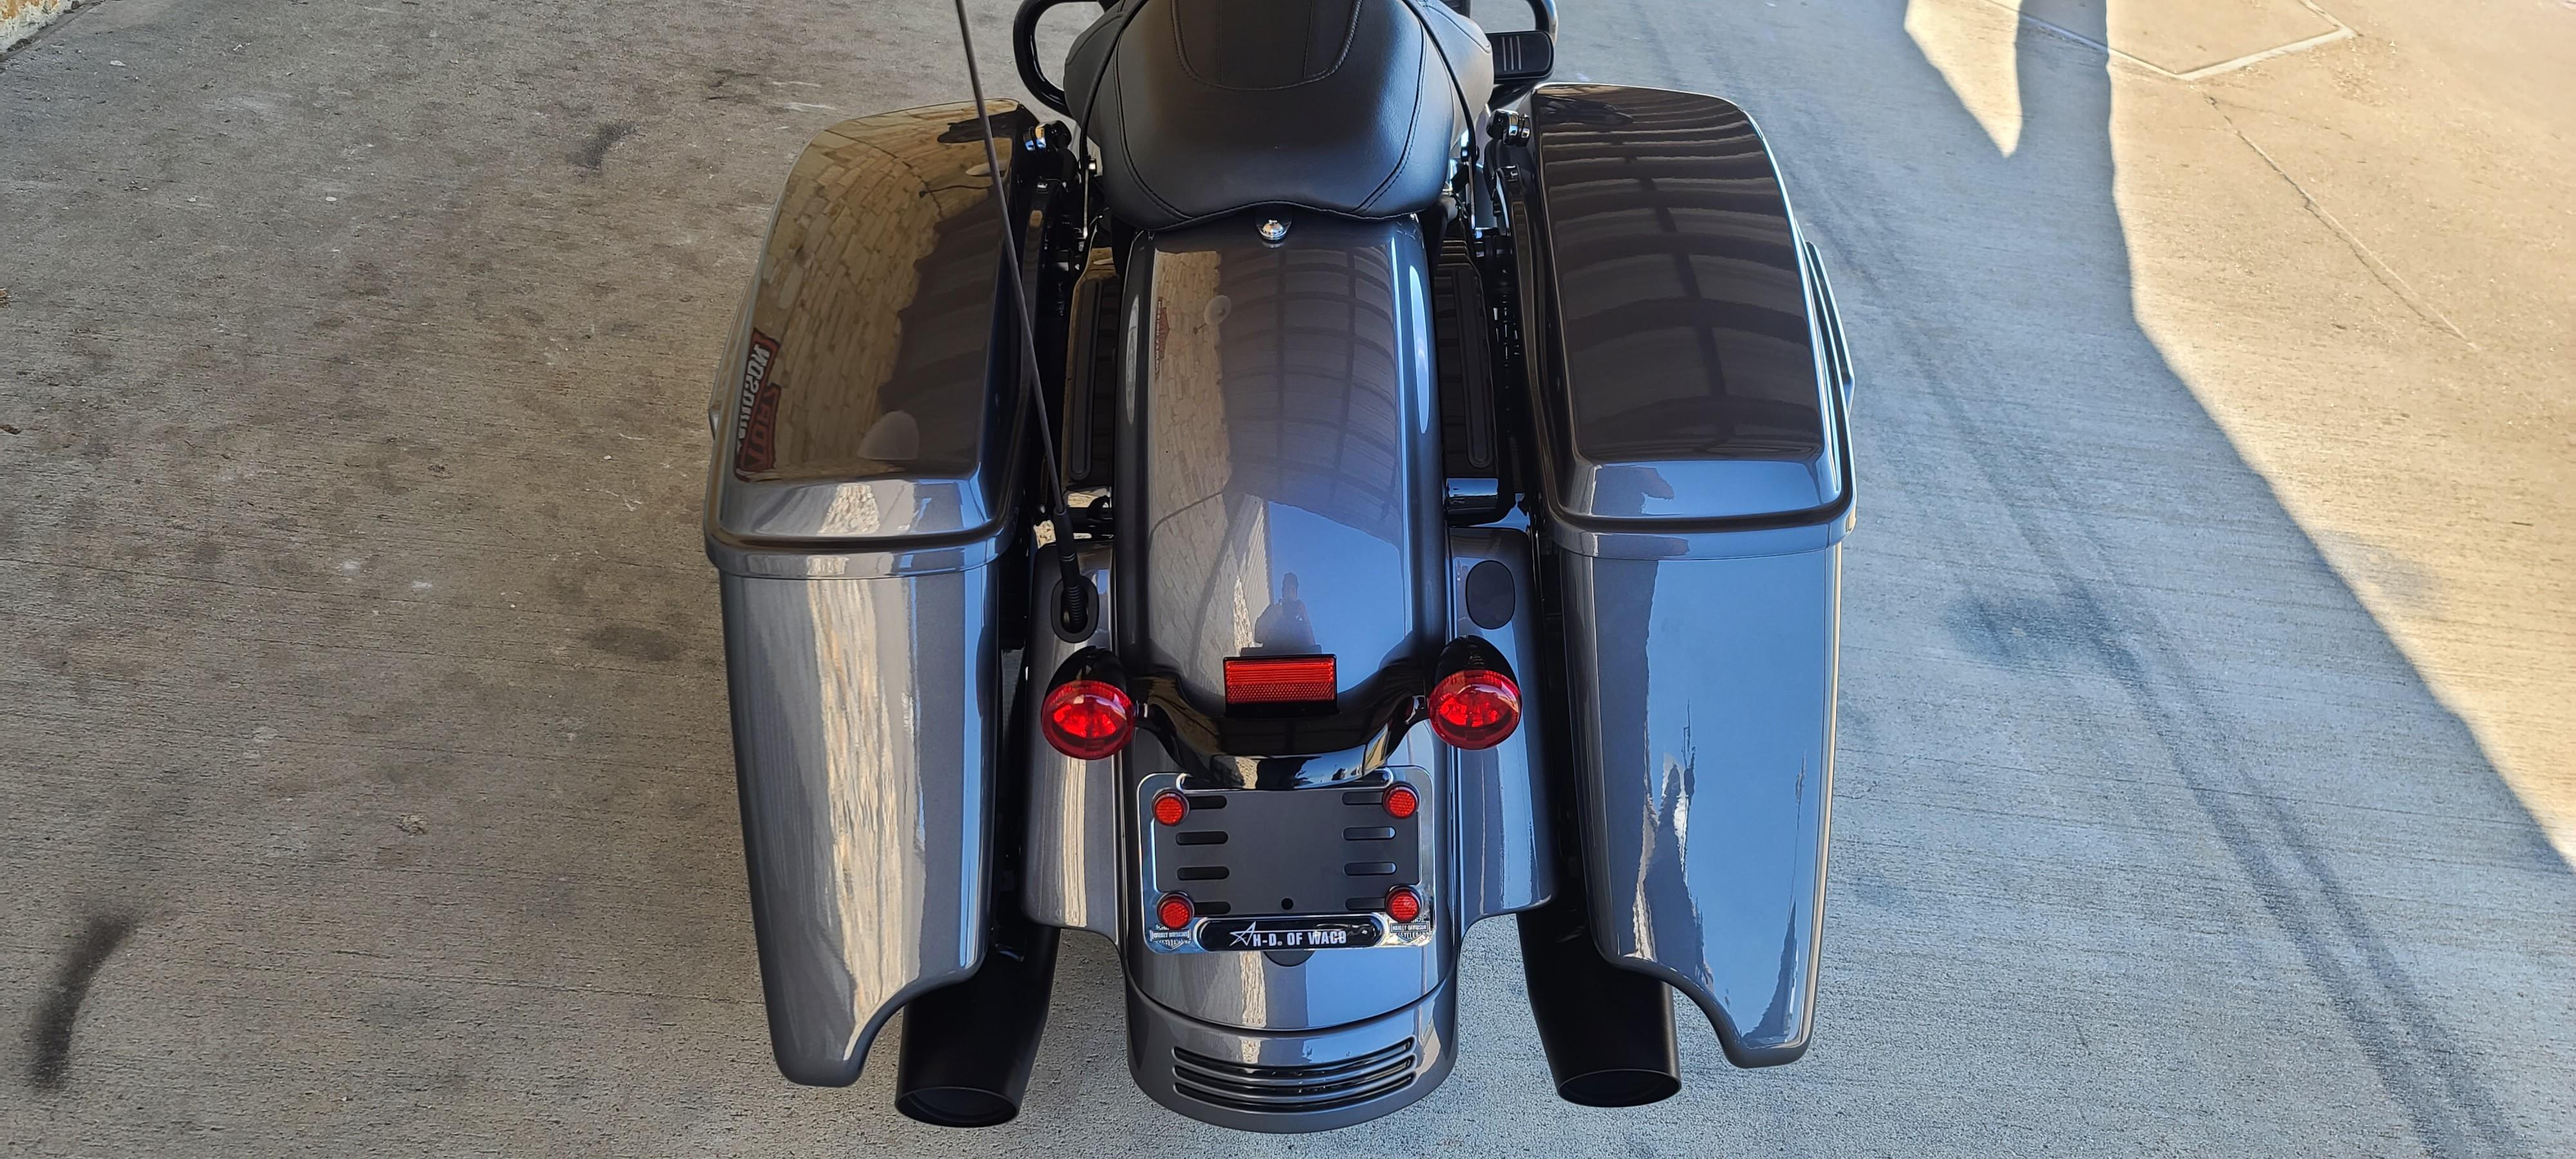 2021 Harley-Davidson FLHXS at Harley-Davidson of Waco